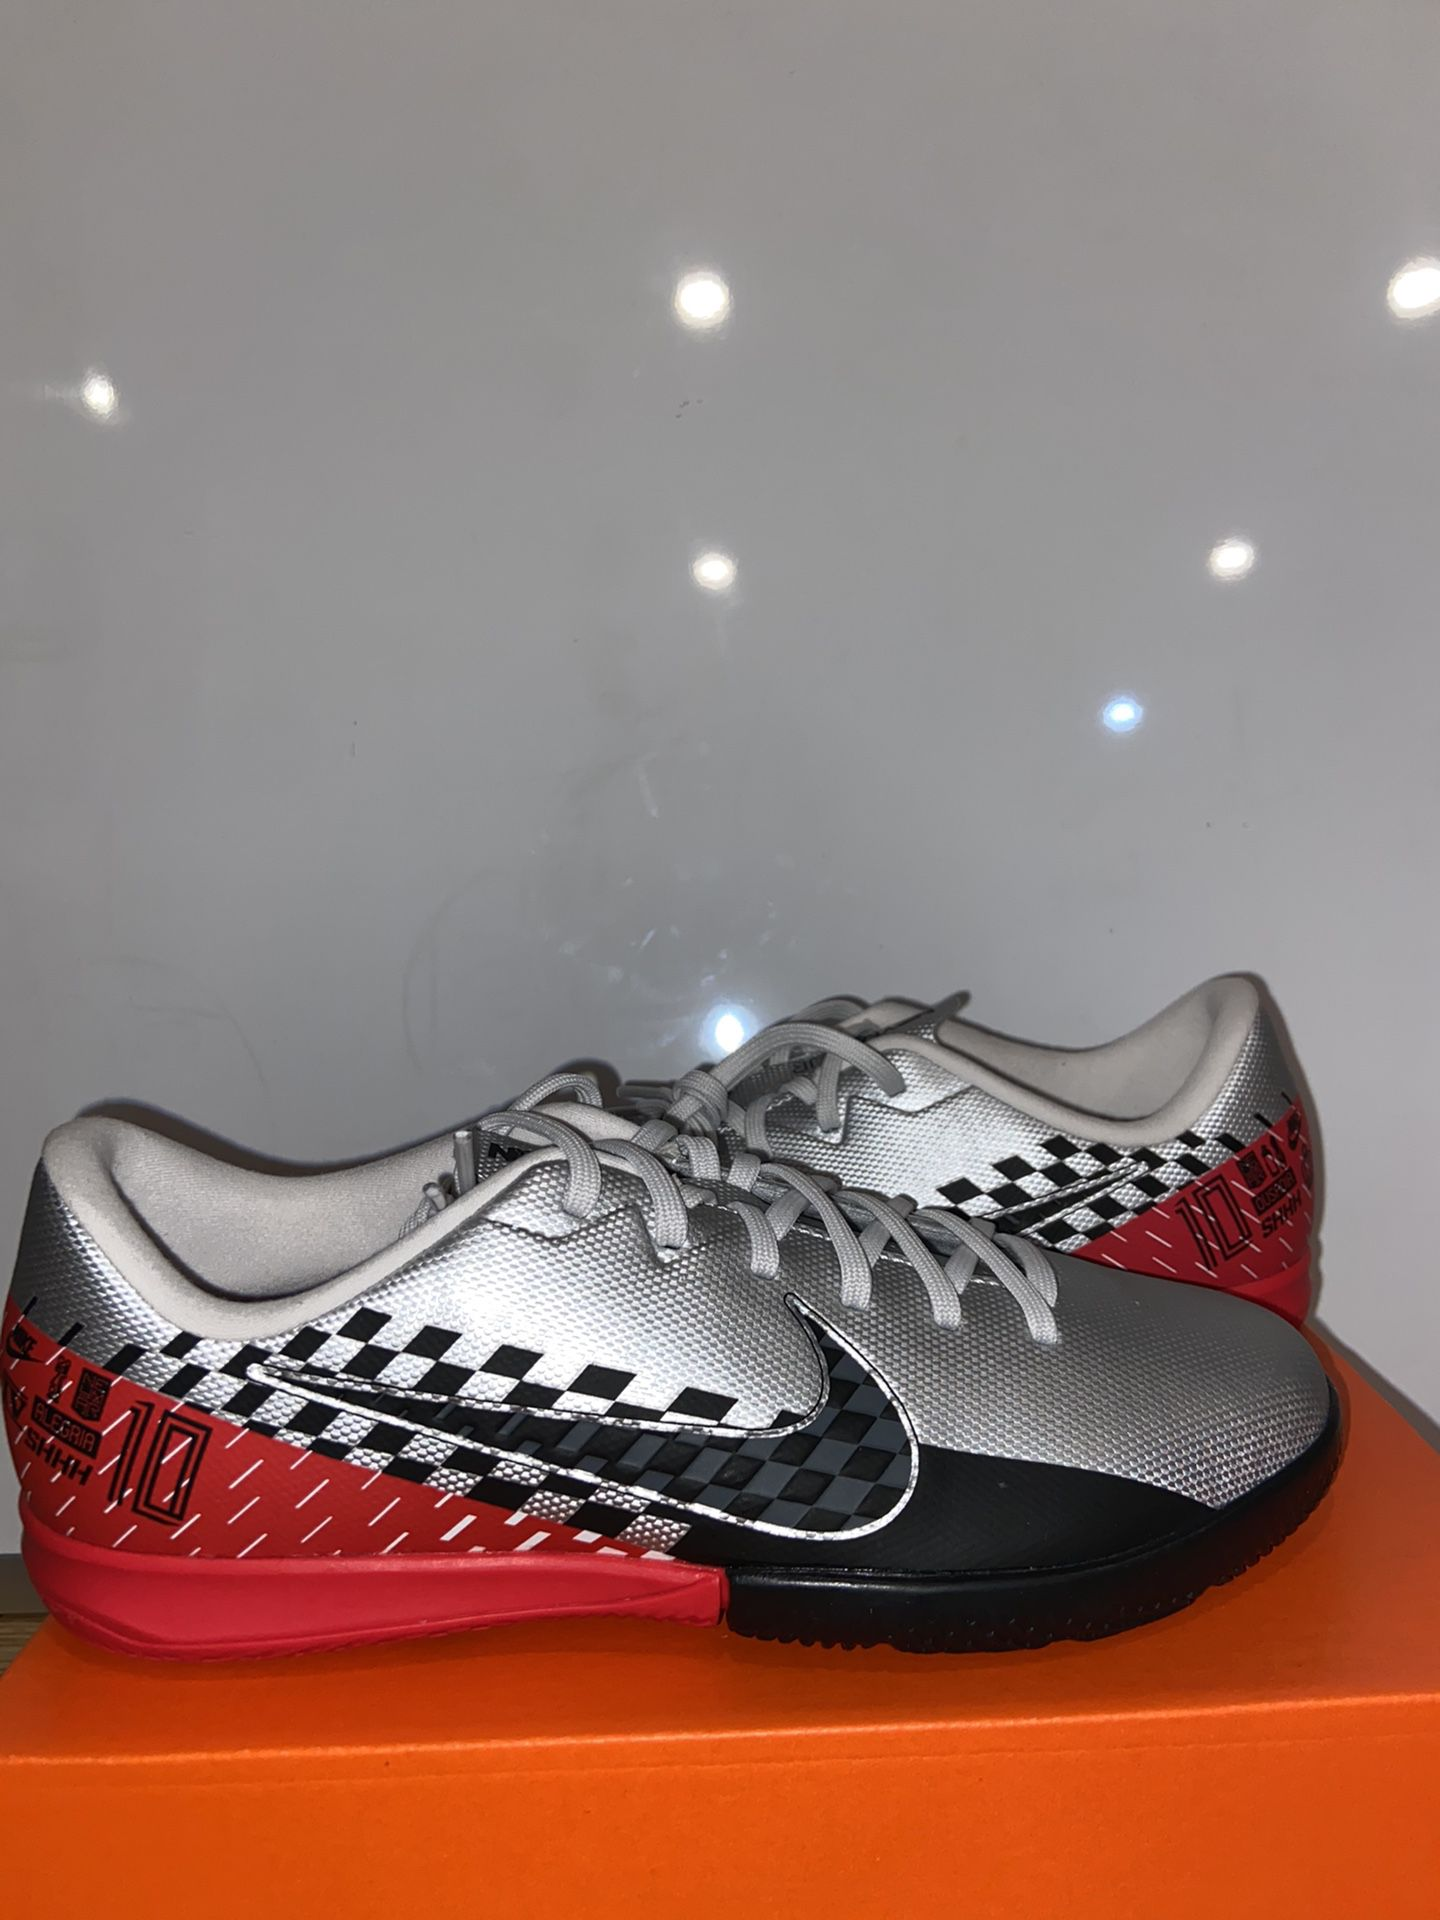 Nike Neymar Indoor Soccer Shoes